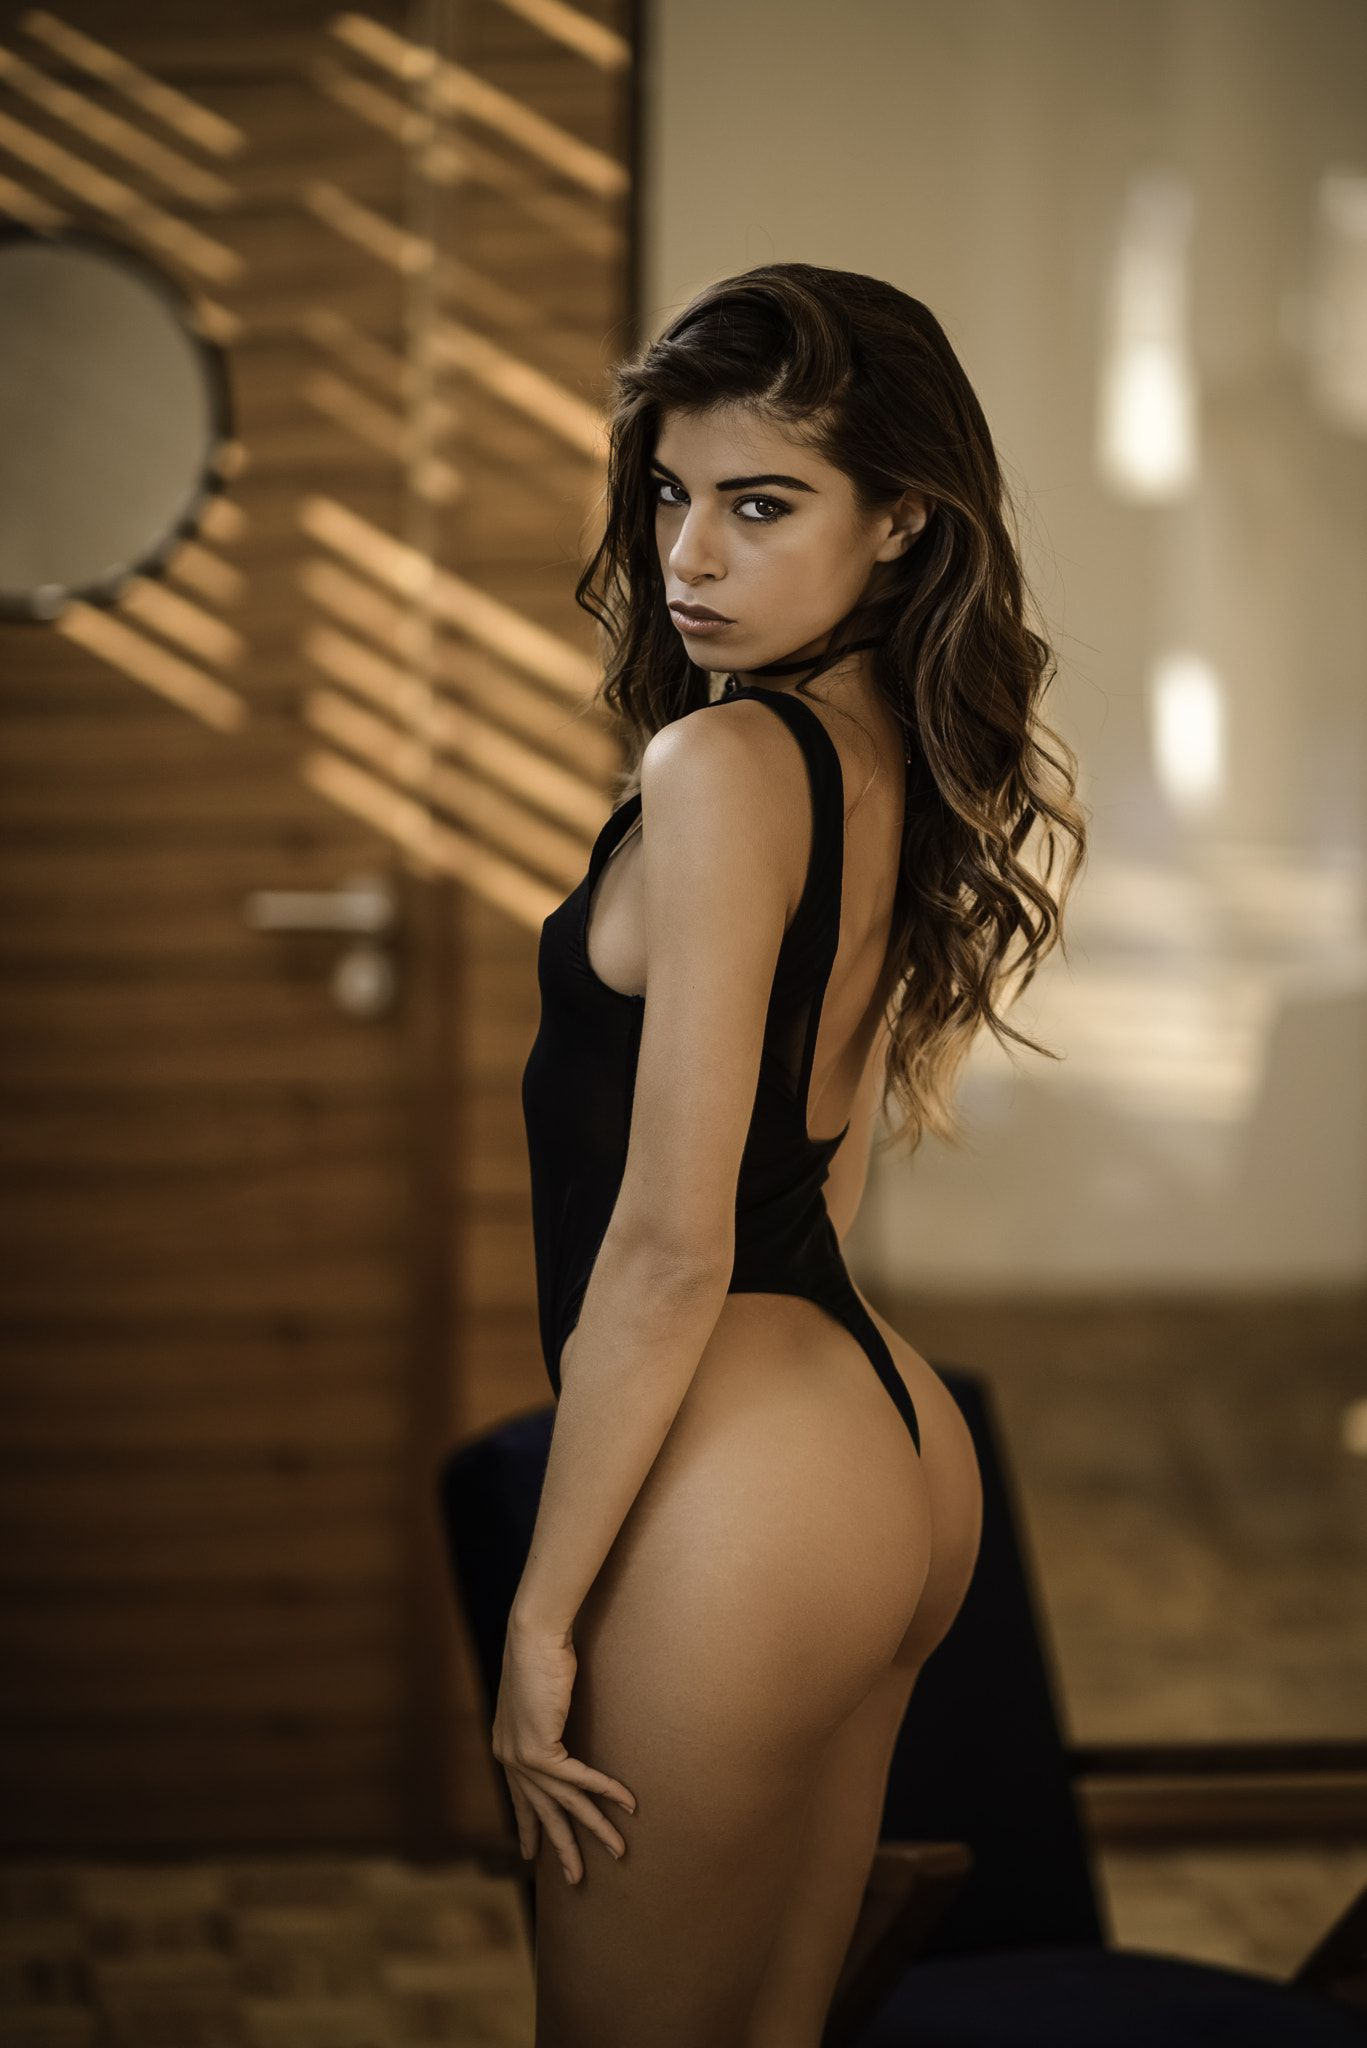 Feet Chiara Bianchino naked (37 photos), Ass, Bikini, Feet, lingerie 2020